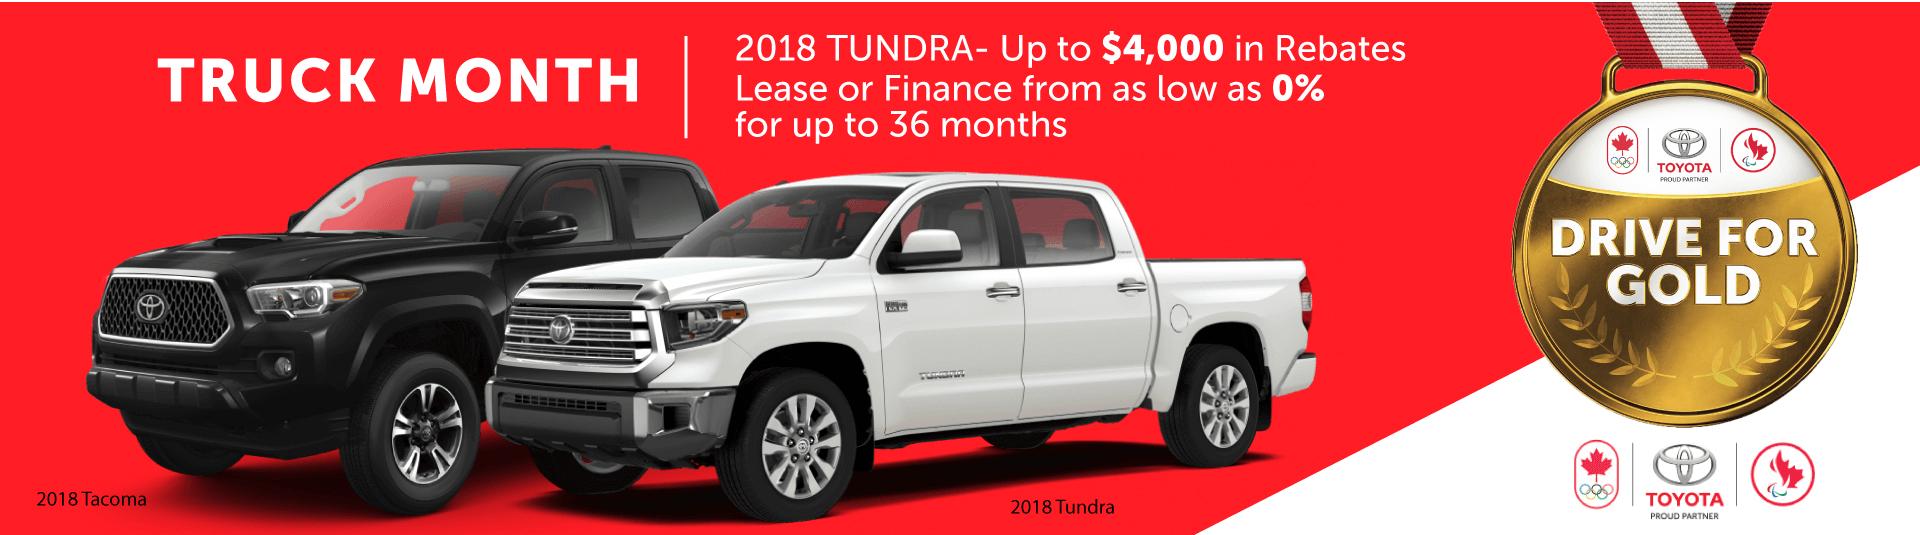 2018 Toyota Tundra Sales